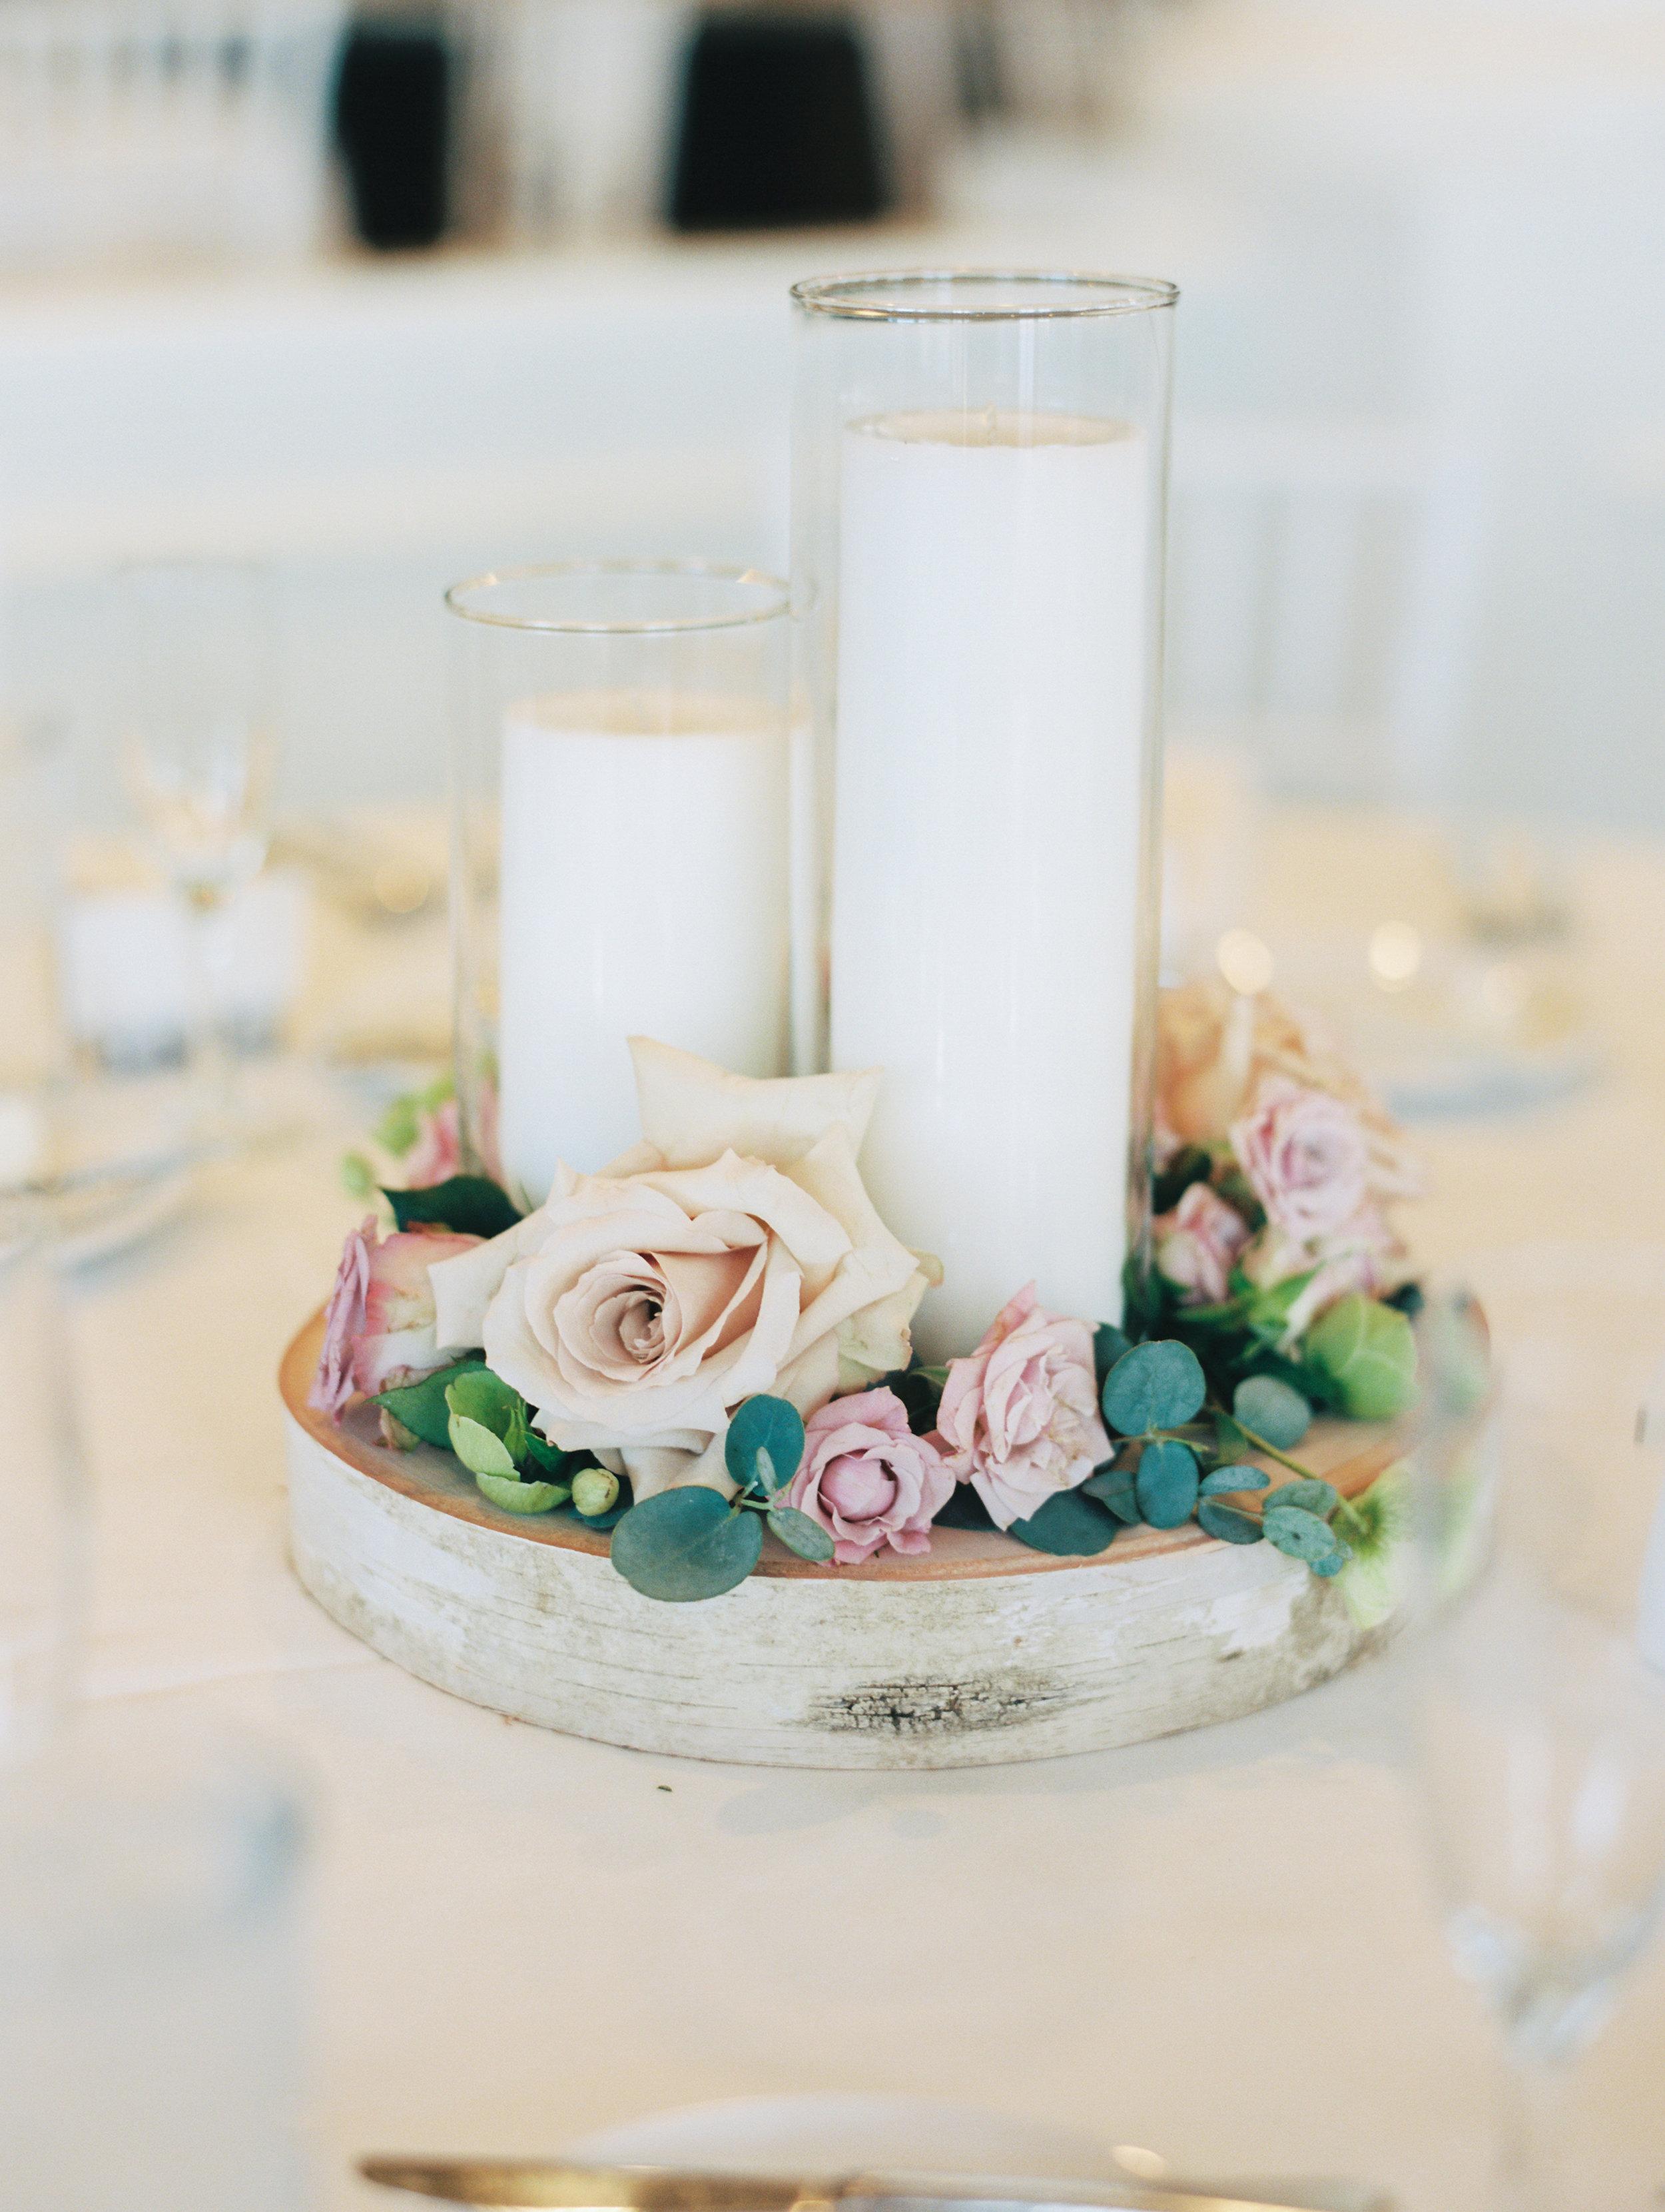 Noss+Wedding+Reception+Details-40.jpg